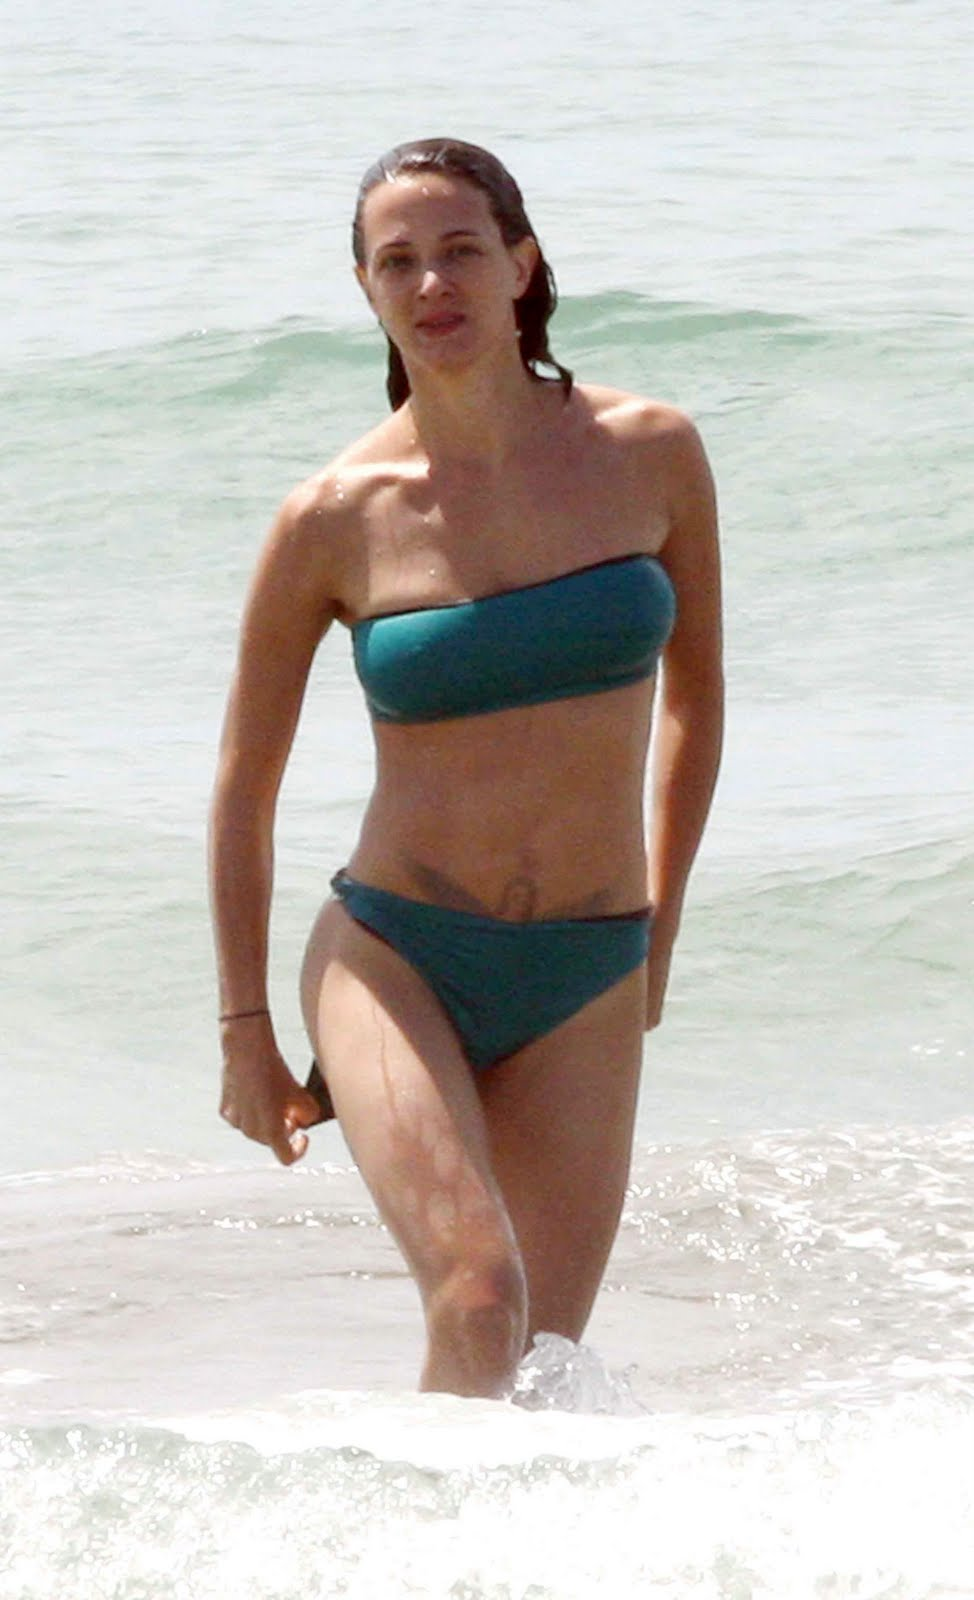 Images: Asia Argento (Green Bikini) on a beach in Forte dei Marmi on 7 ... Lady Gaga